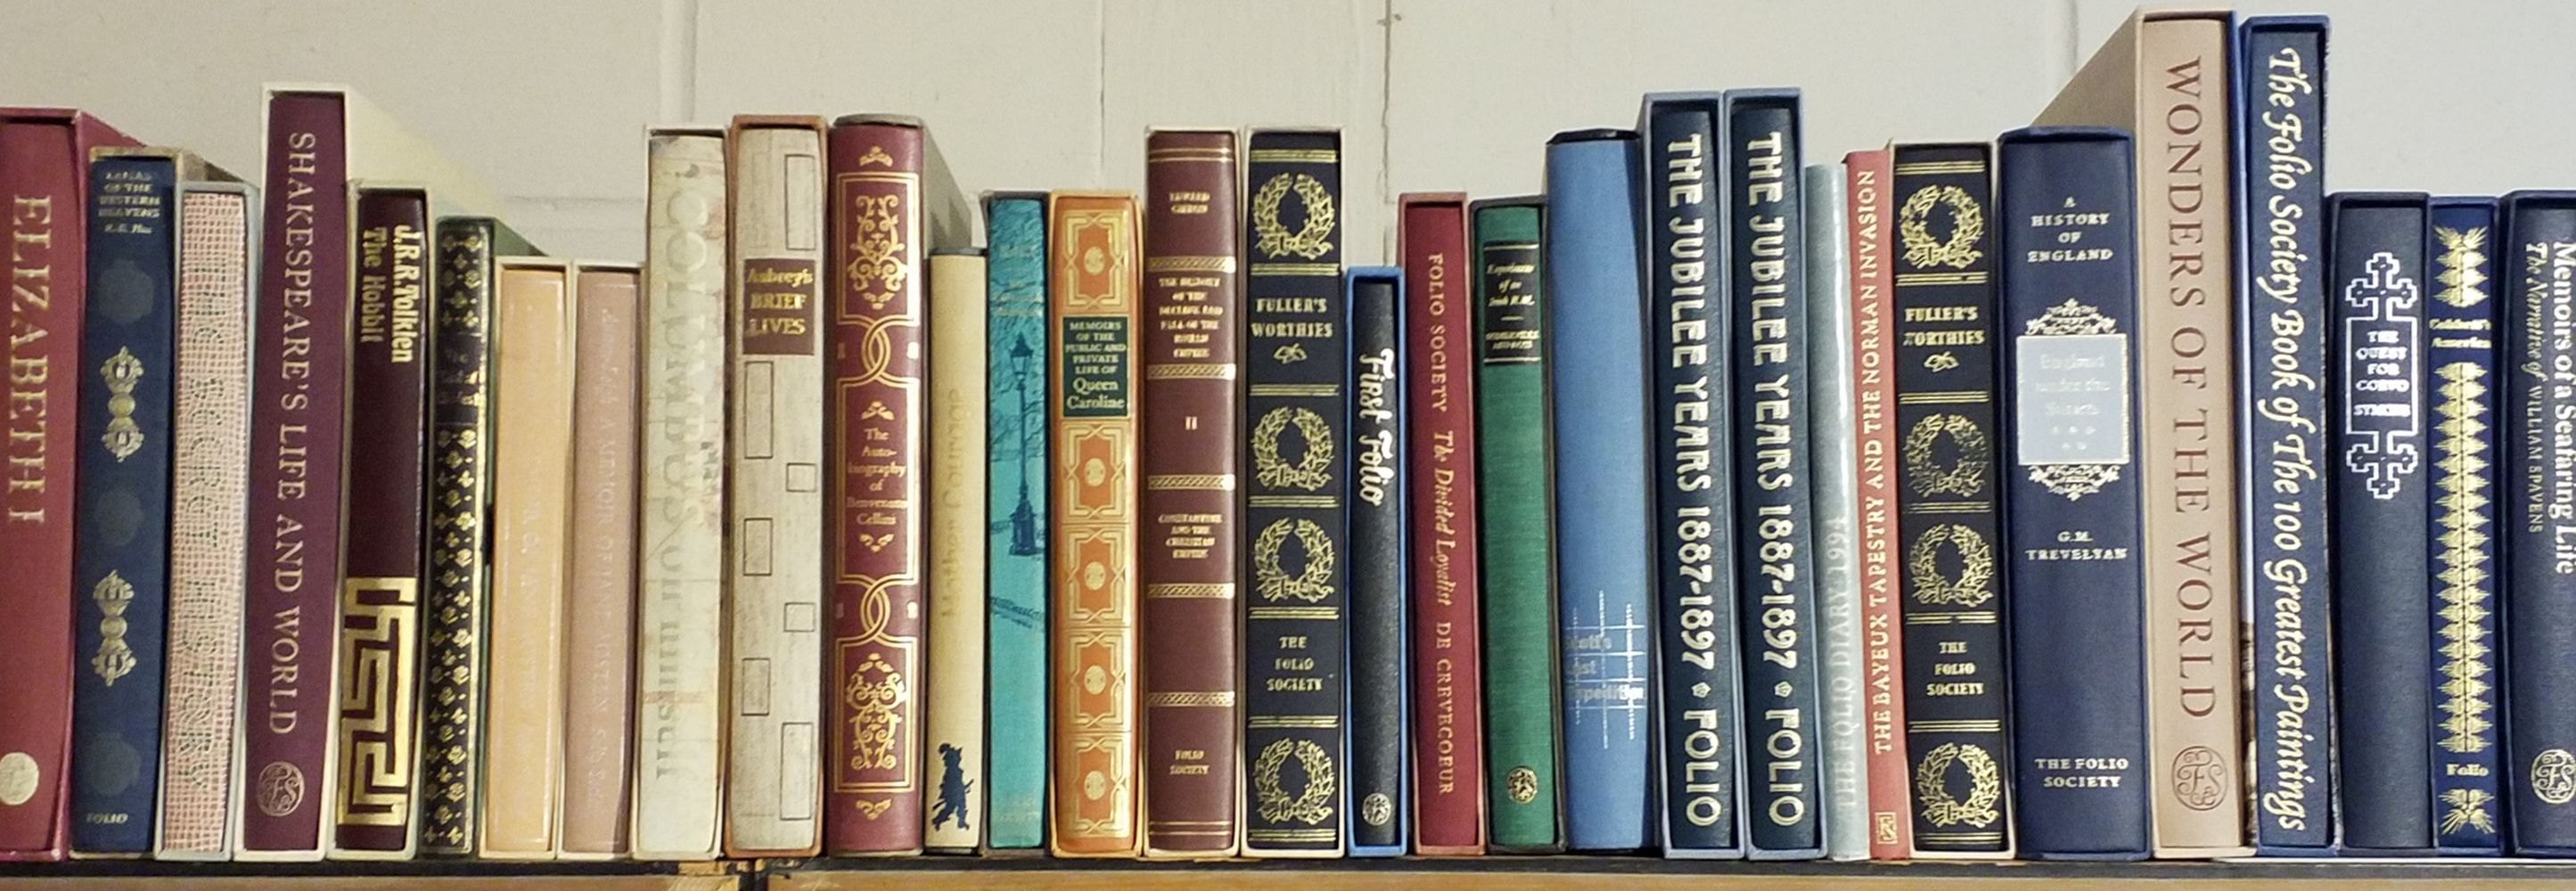 Folio Society. 78 volumes - Image 2 of 4